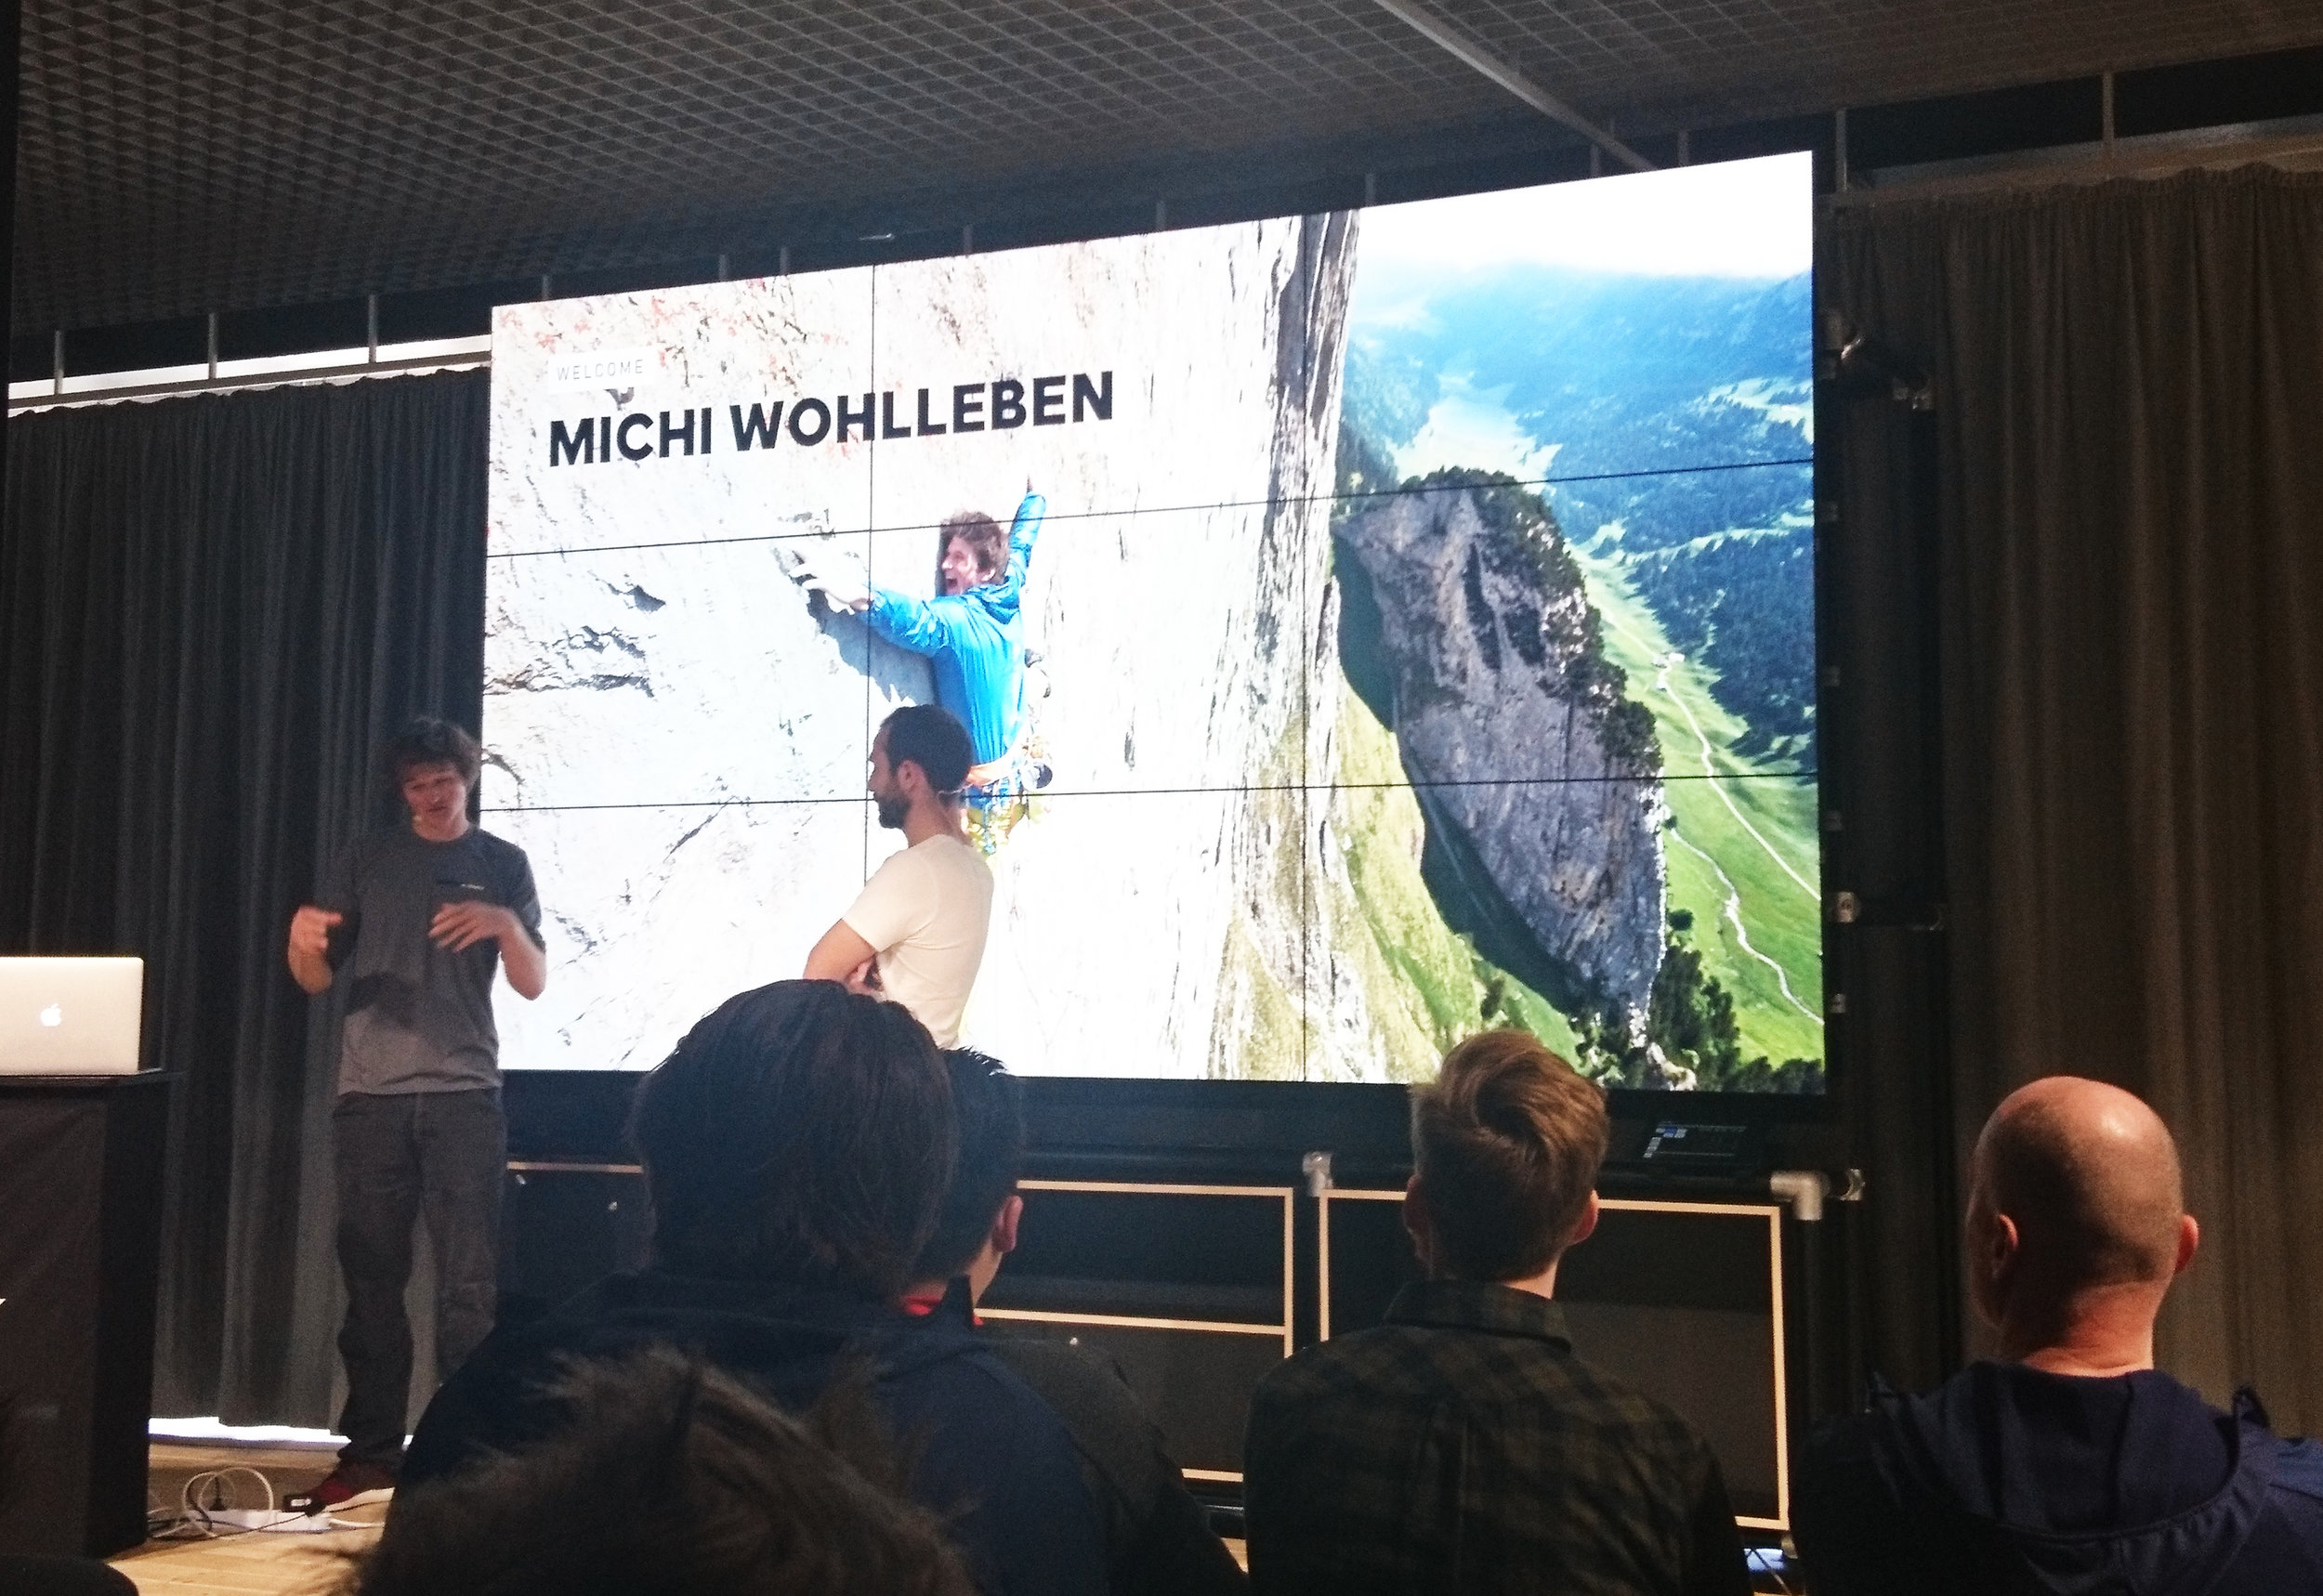 Michi Wohlleben conférence